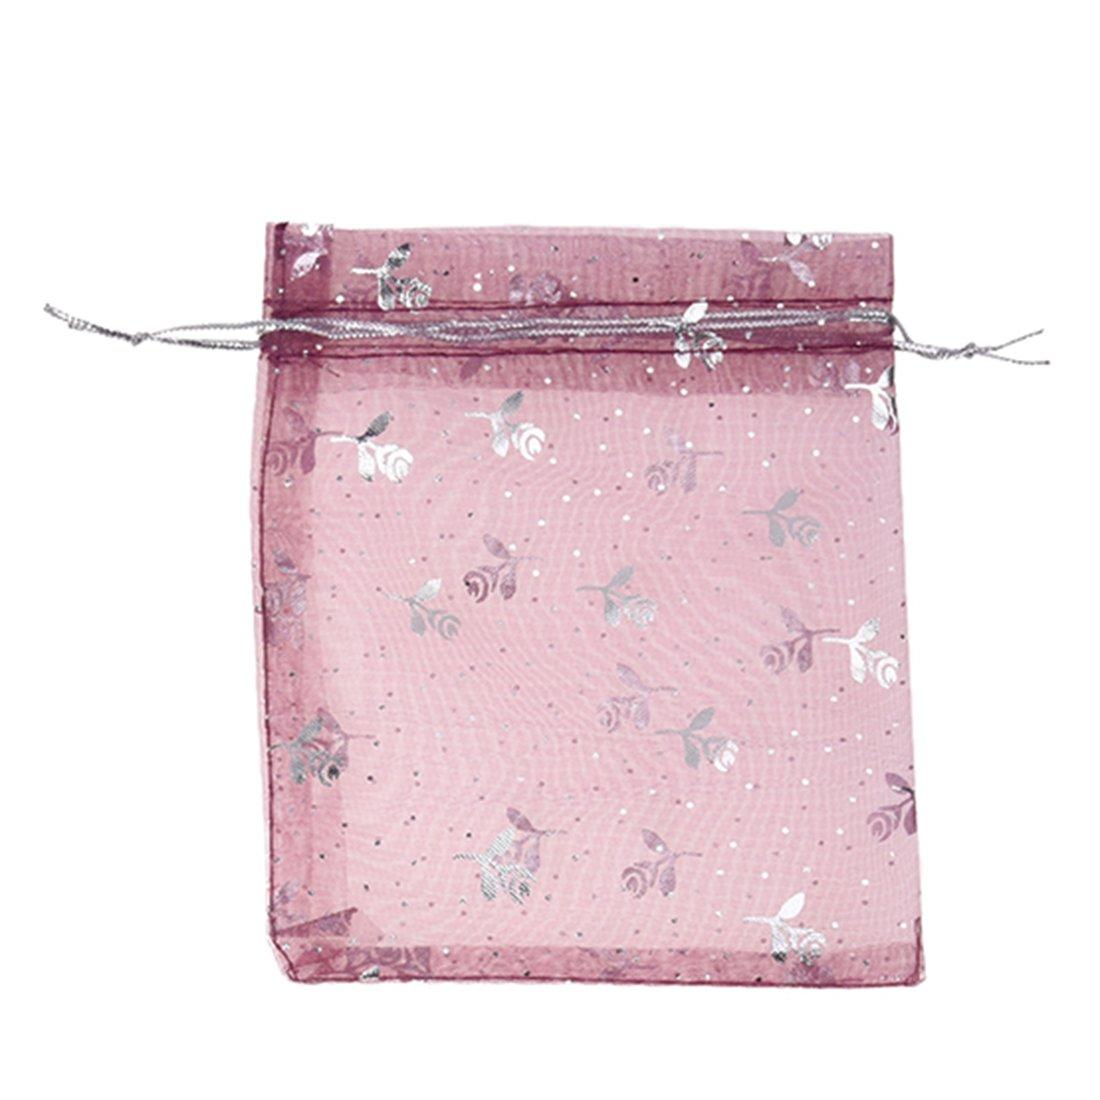 SODIAL(R) 100 mezclo la bolsa del Organza para la joyeria, regalo de la boda 13cm X 10cm 027688